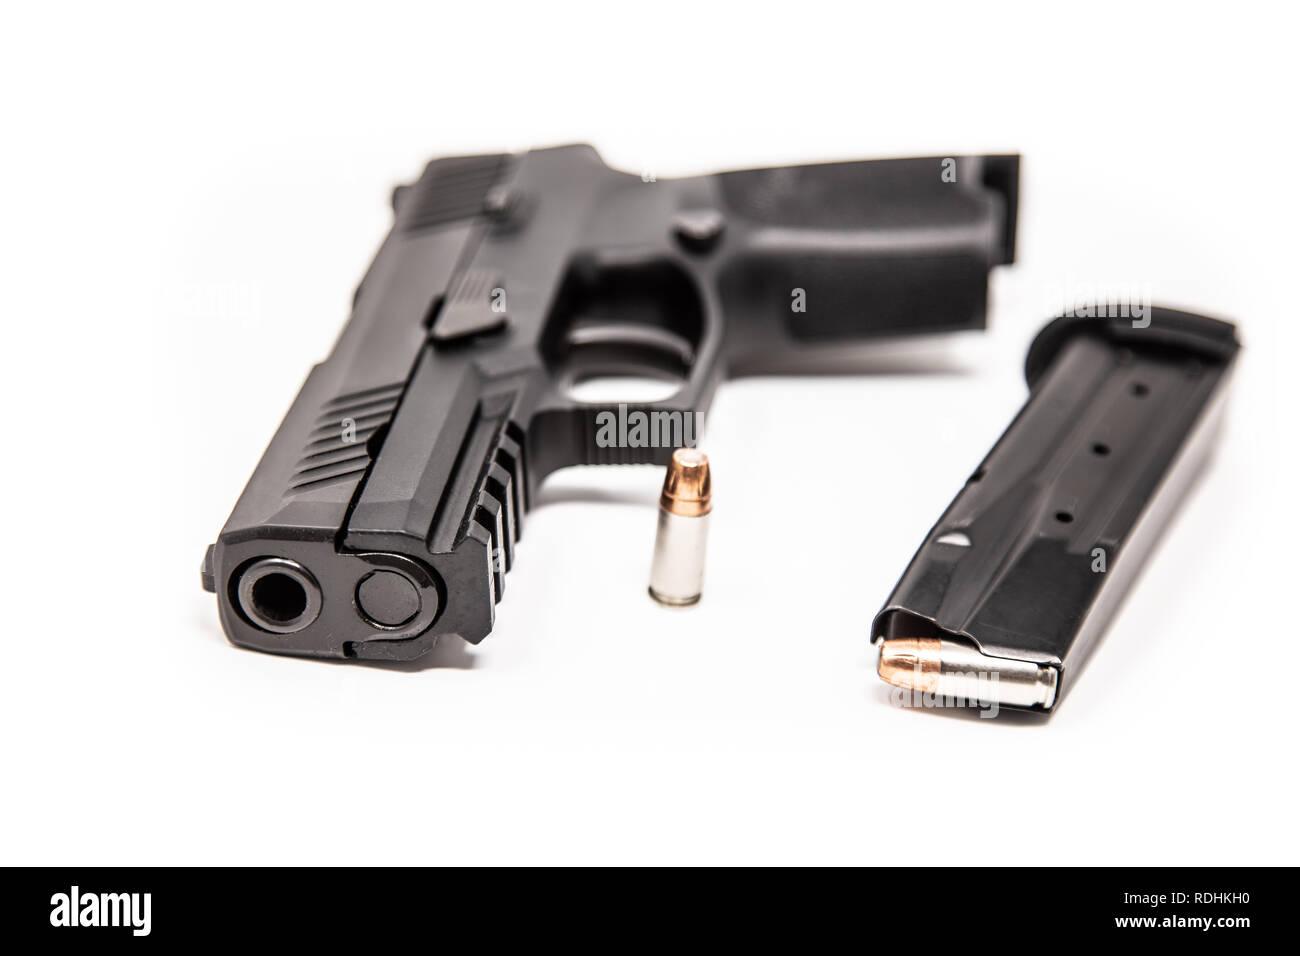 Black Semi-Automatic Handgun & Bullet w/ Magazine - High Key on White Background - Stock Image